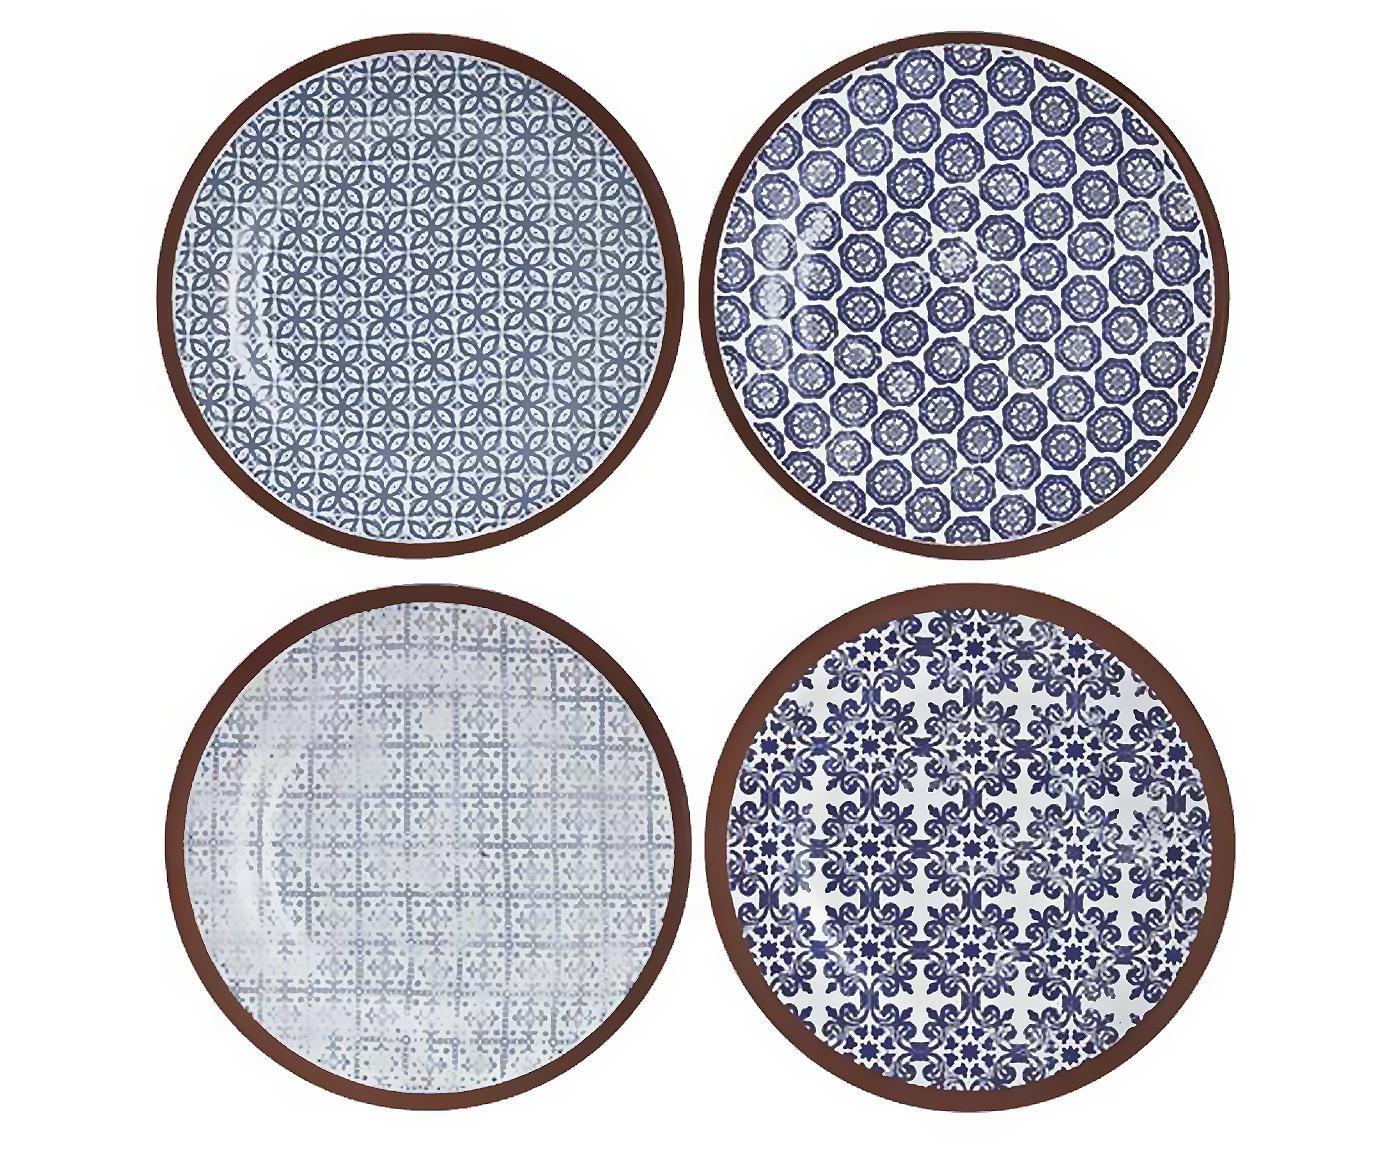 Handgefertigtes Frühstücksteller-Set Tapas, 4-tlg., Terrakotta, Blau, Weiss, Braun, Ø 19 cm